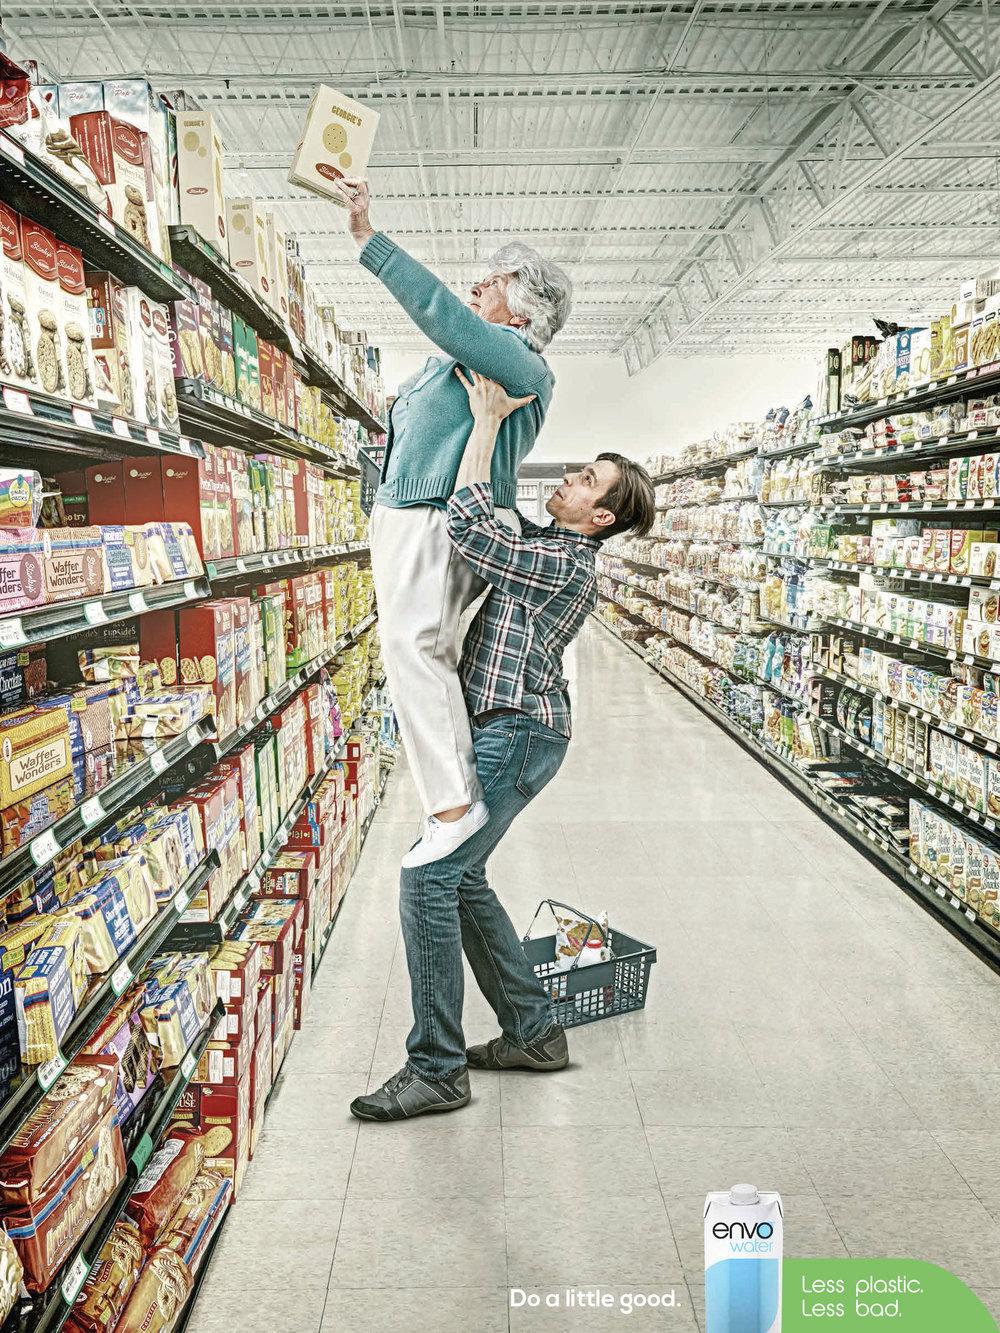 envo-poster-grocery.jpg